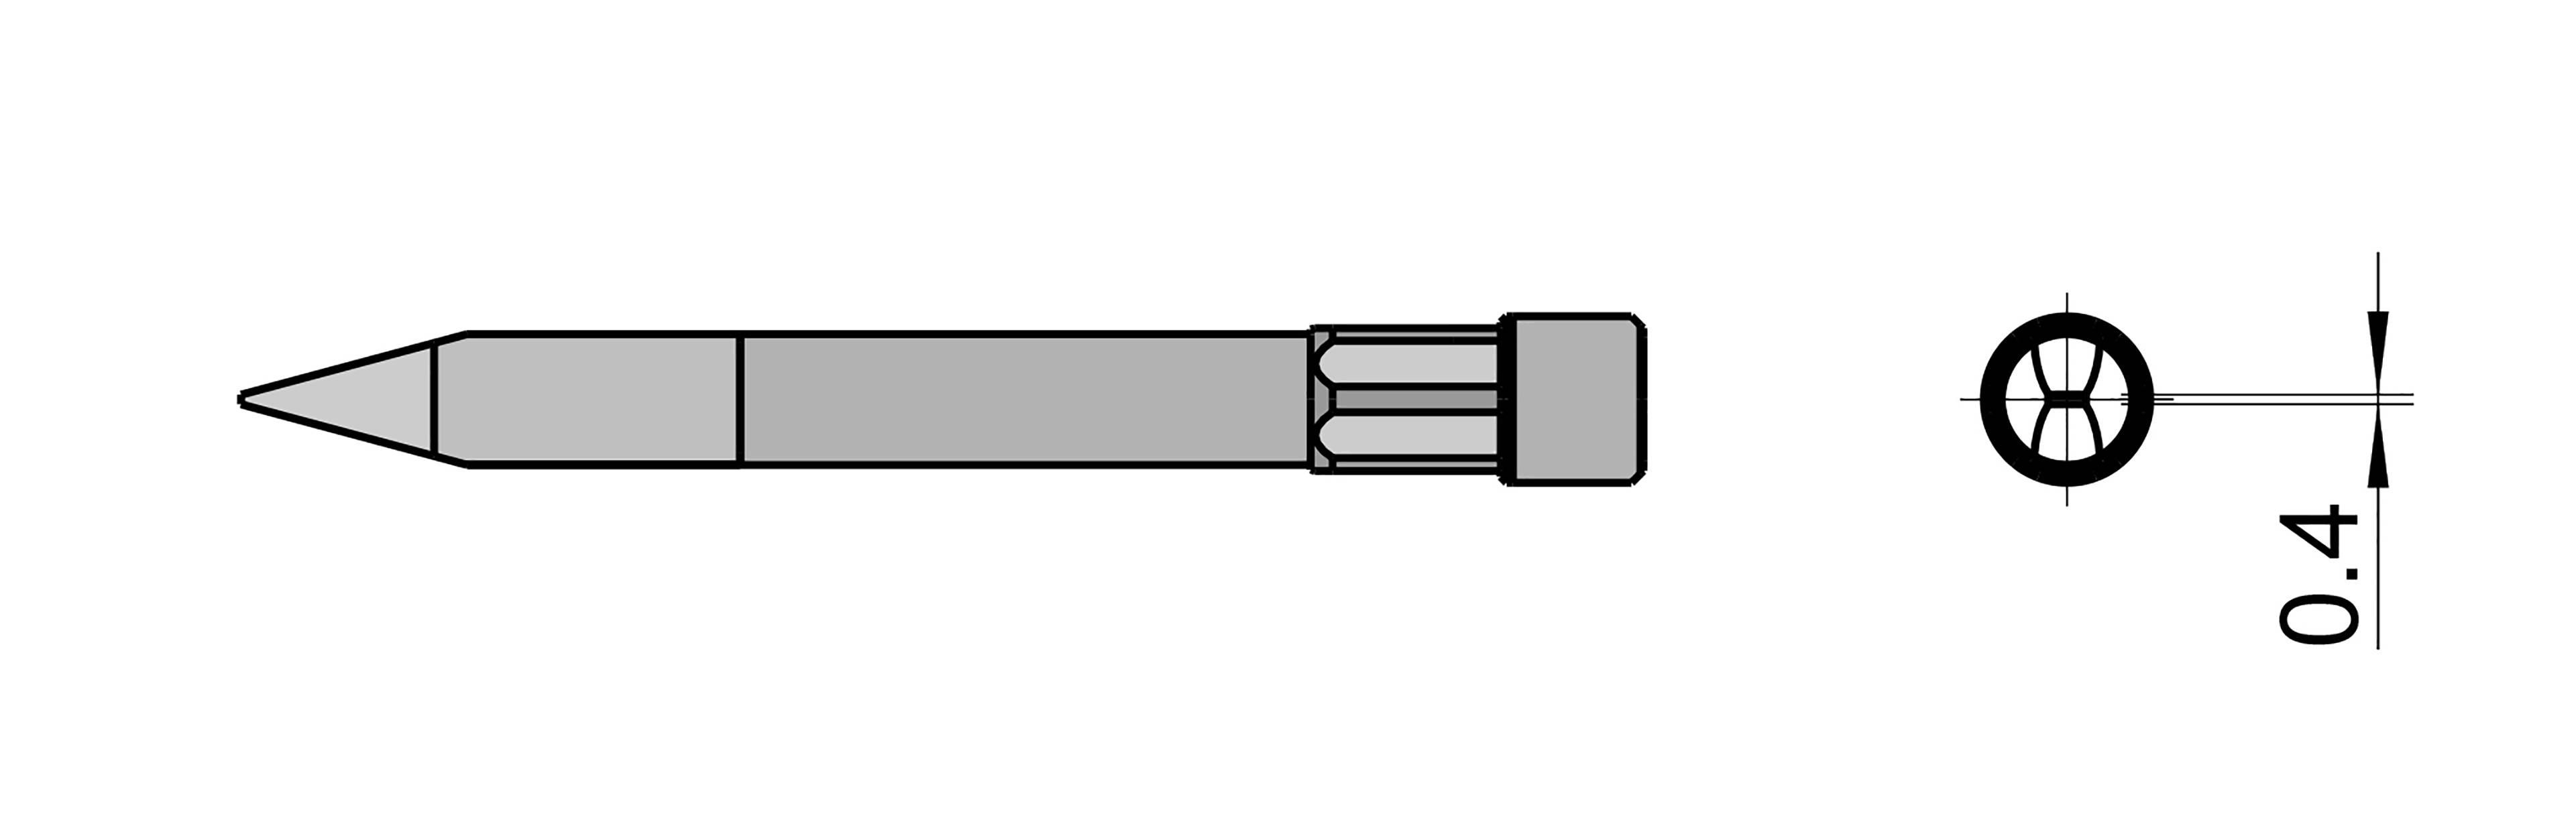 Spájkovací hrot dlátová forma Weller Professional T0054490499, velikost hrotu 0.4 mm, délka hrotu 59 mm, 1 ks